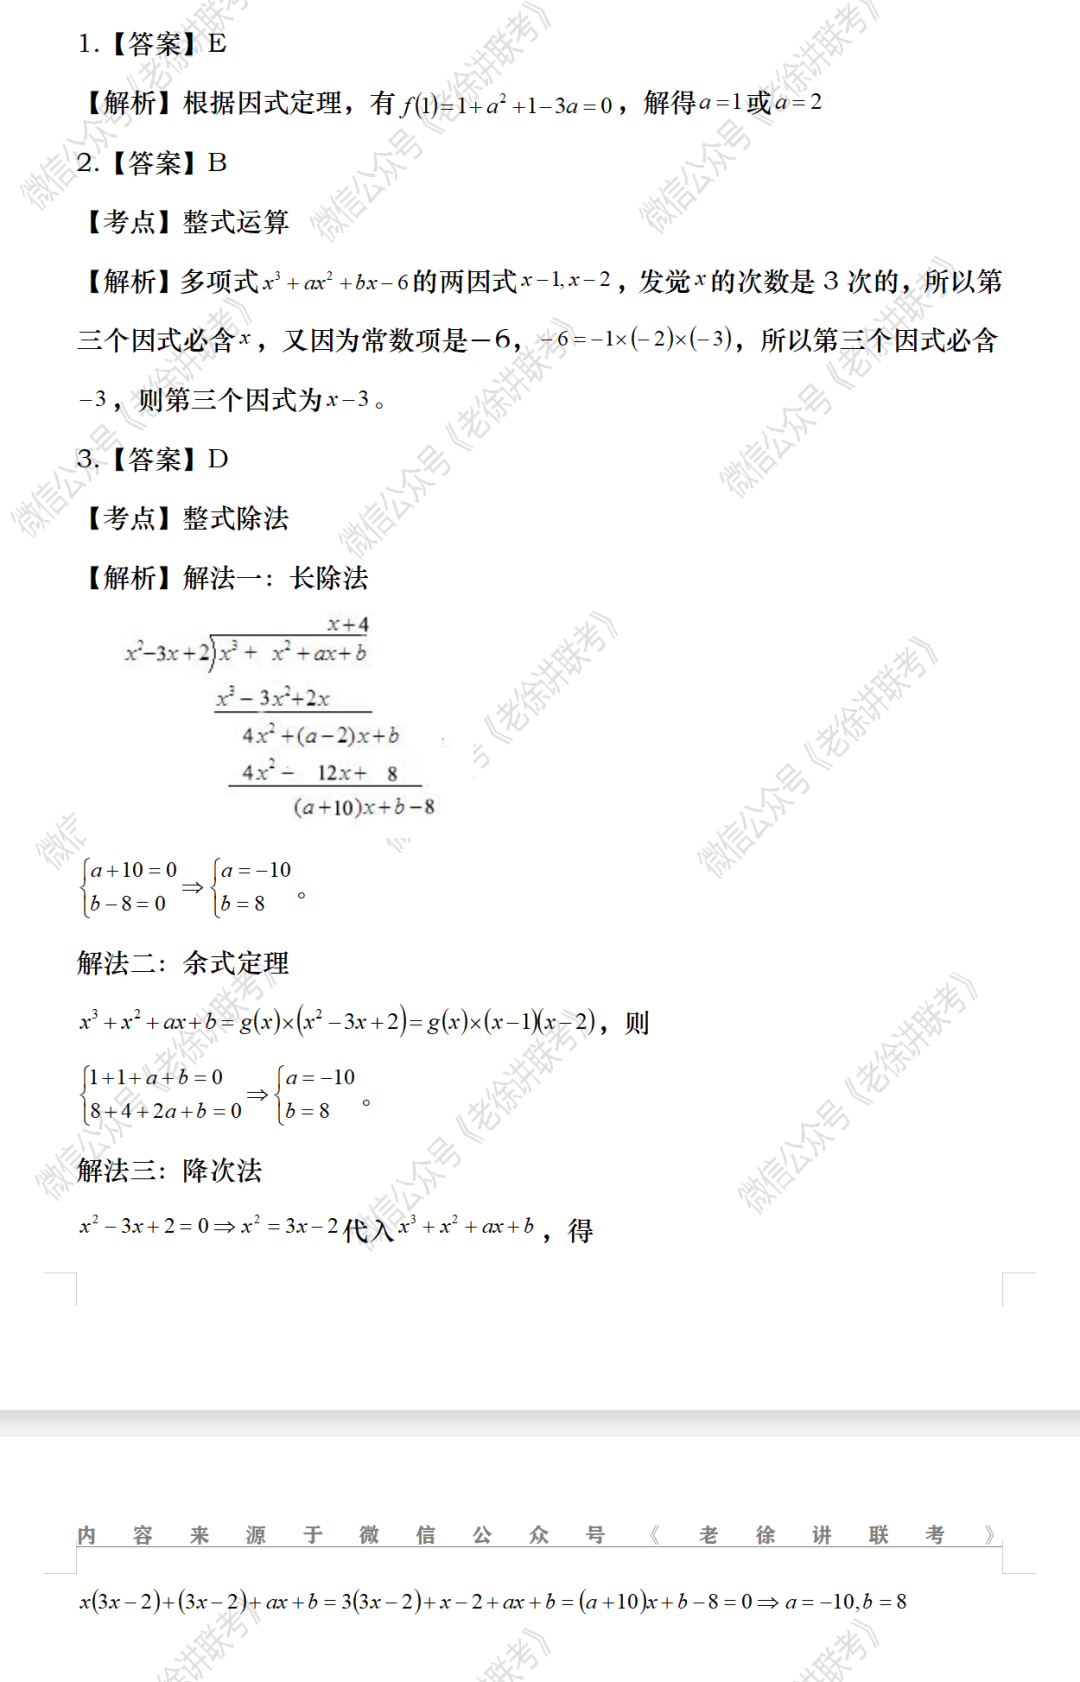 2022MBA考研|管理类联考:数学专题训练-整式的变形与化简(第一期)